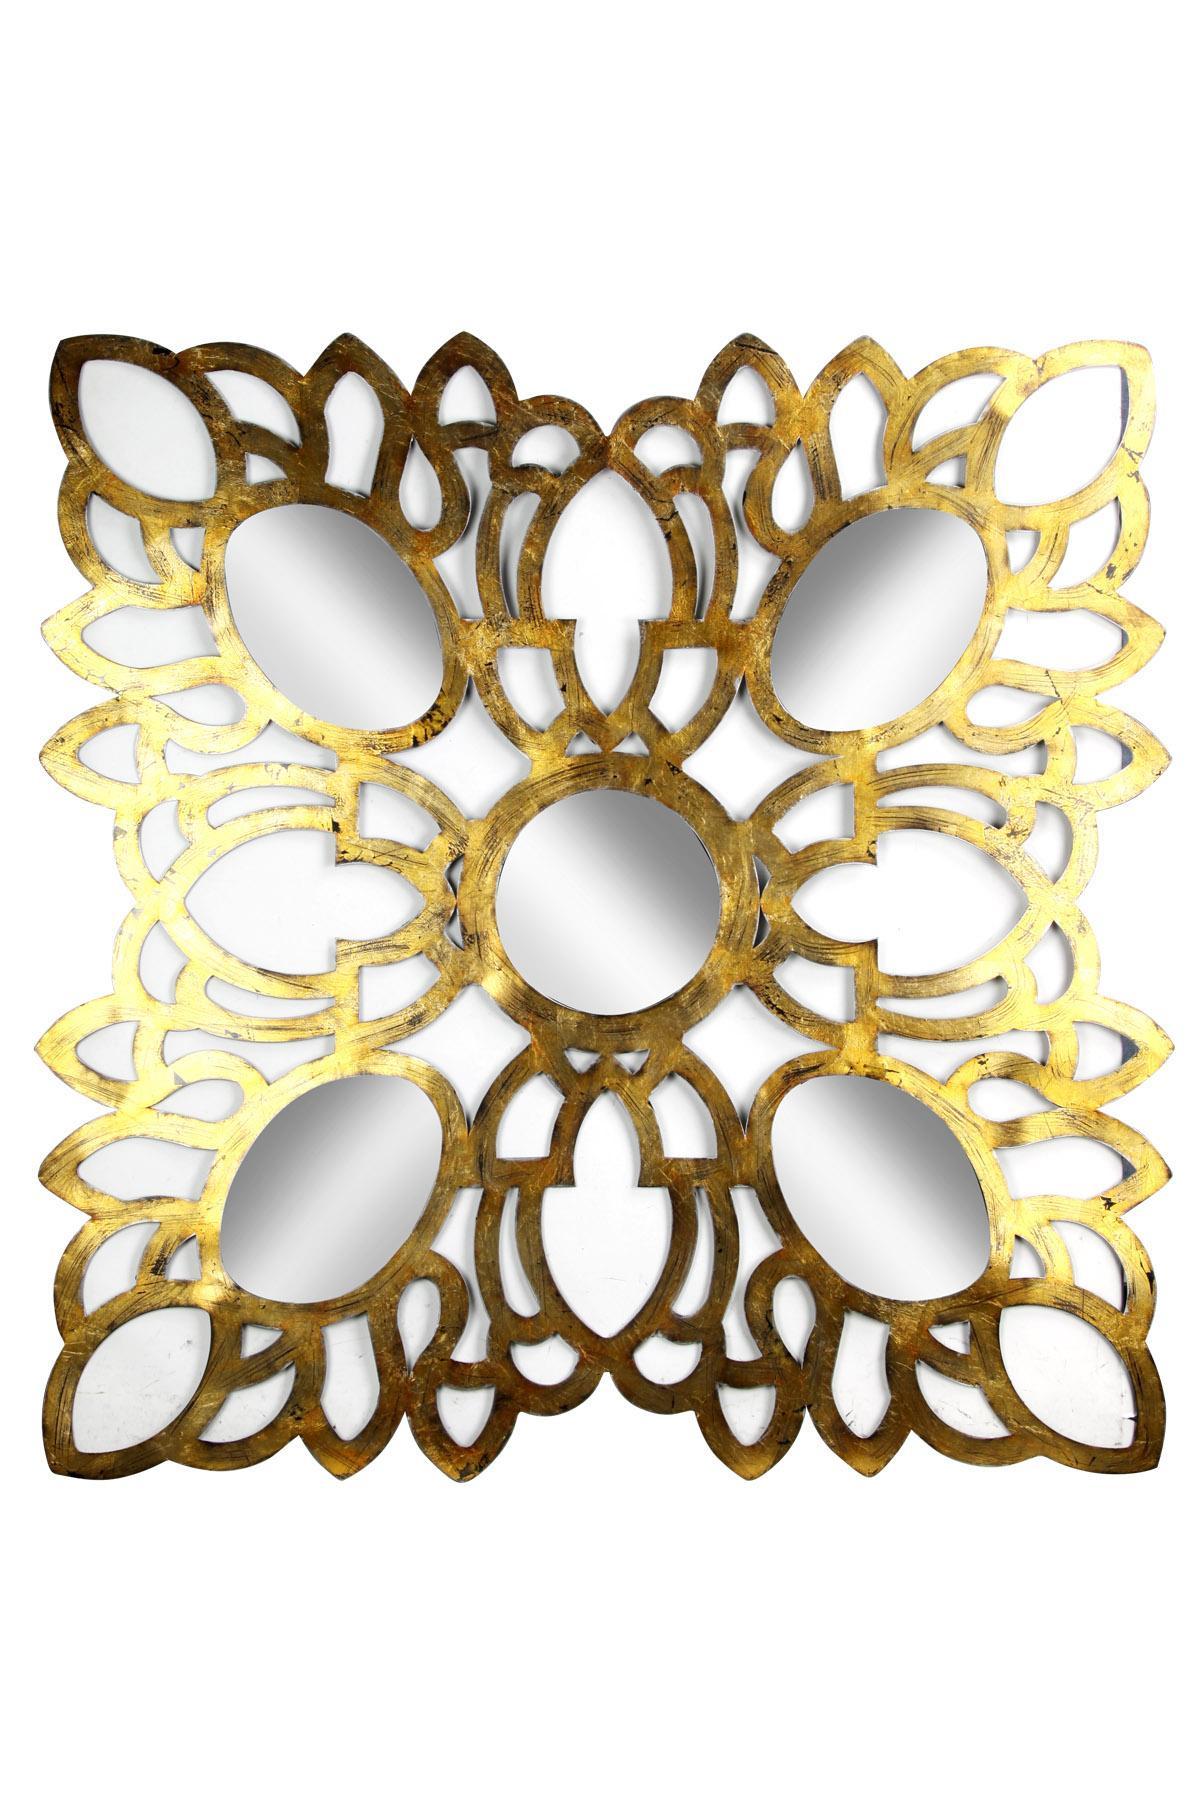 62c49feb6a03 Holywood Glam Gold Mirror Round Designs Inside Square Frame - Boulevard  Urban Living